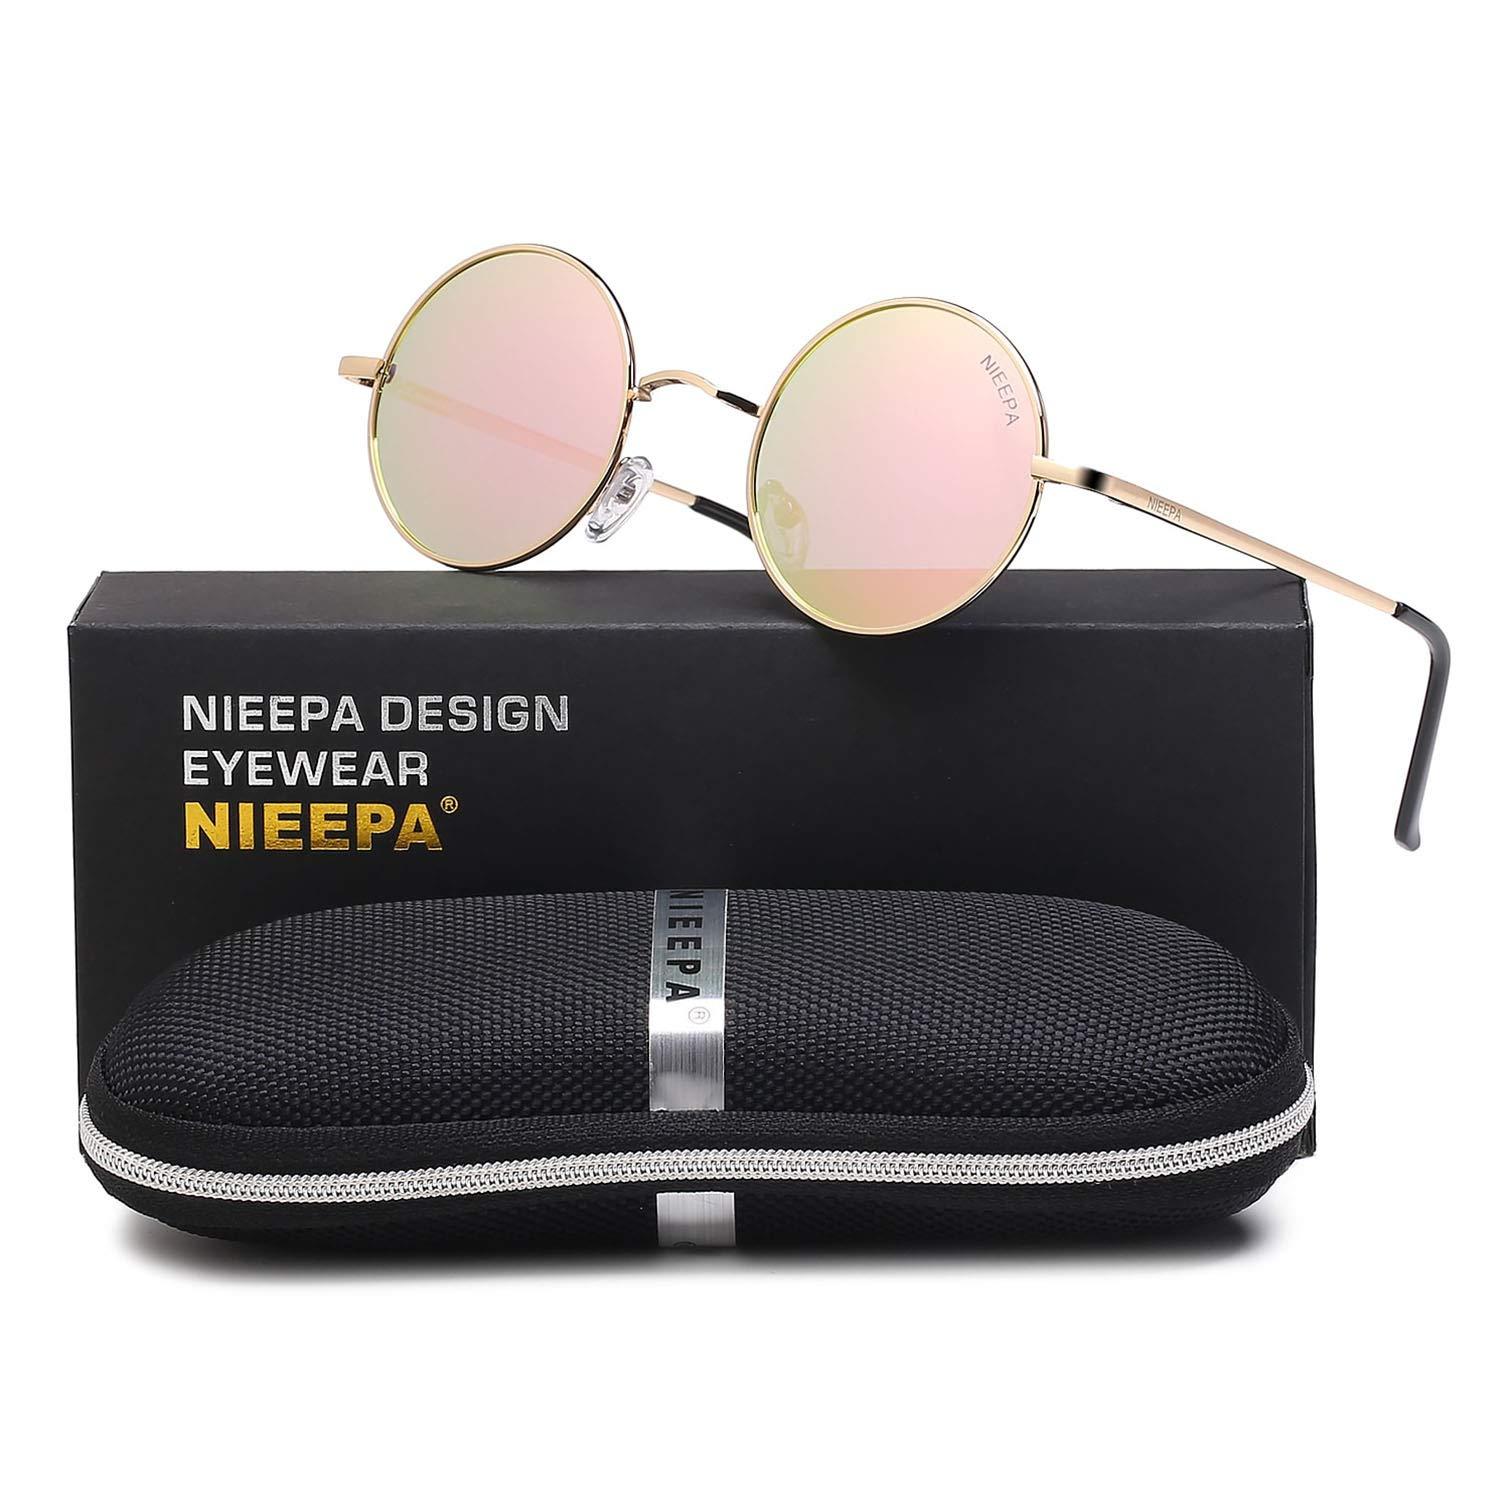 NIEEPA John Lennon Vintage Round Polarized Hippie Sunglasses Small Circle Sun Glasses (Pink Lens/Rose Gold Frame) by NIEEPA